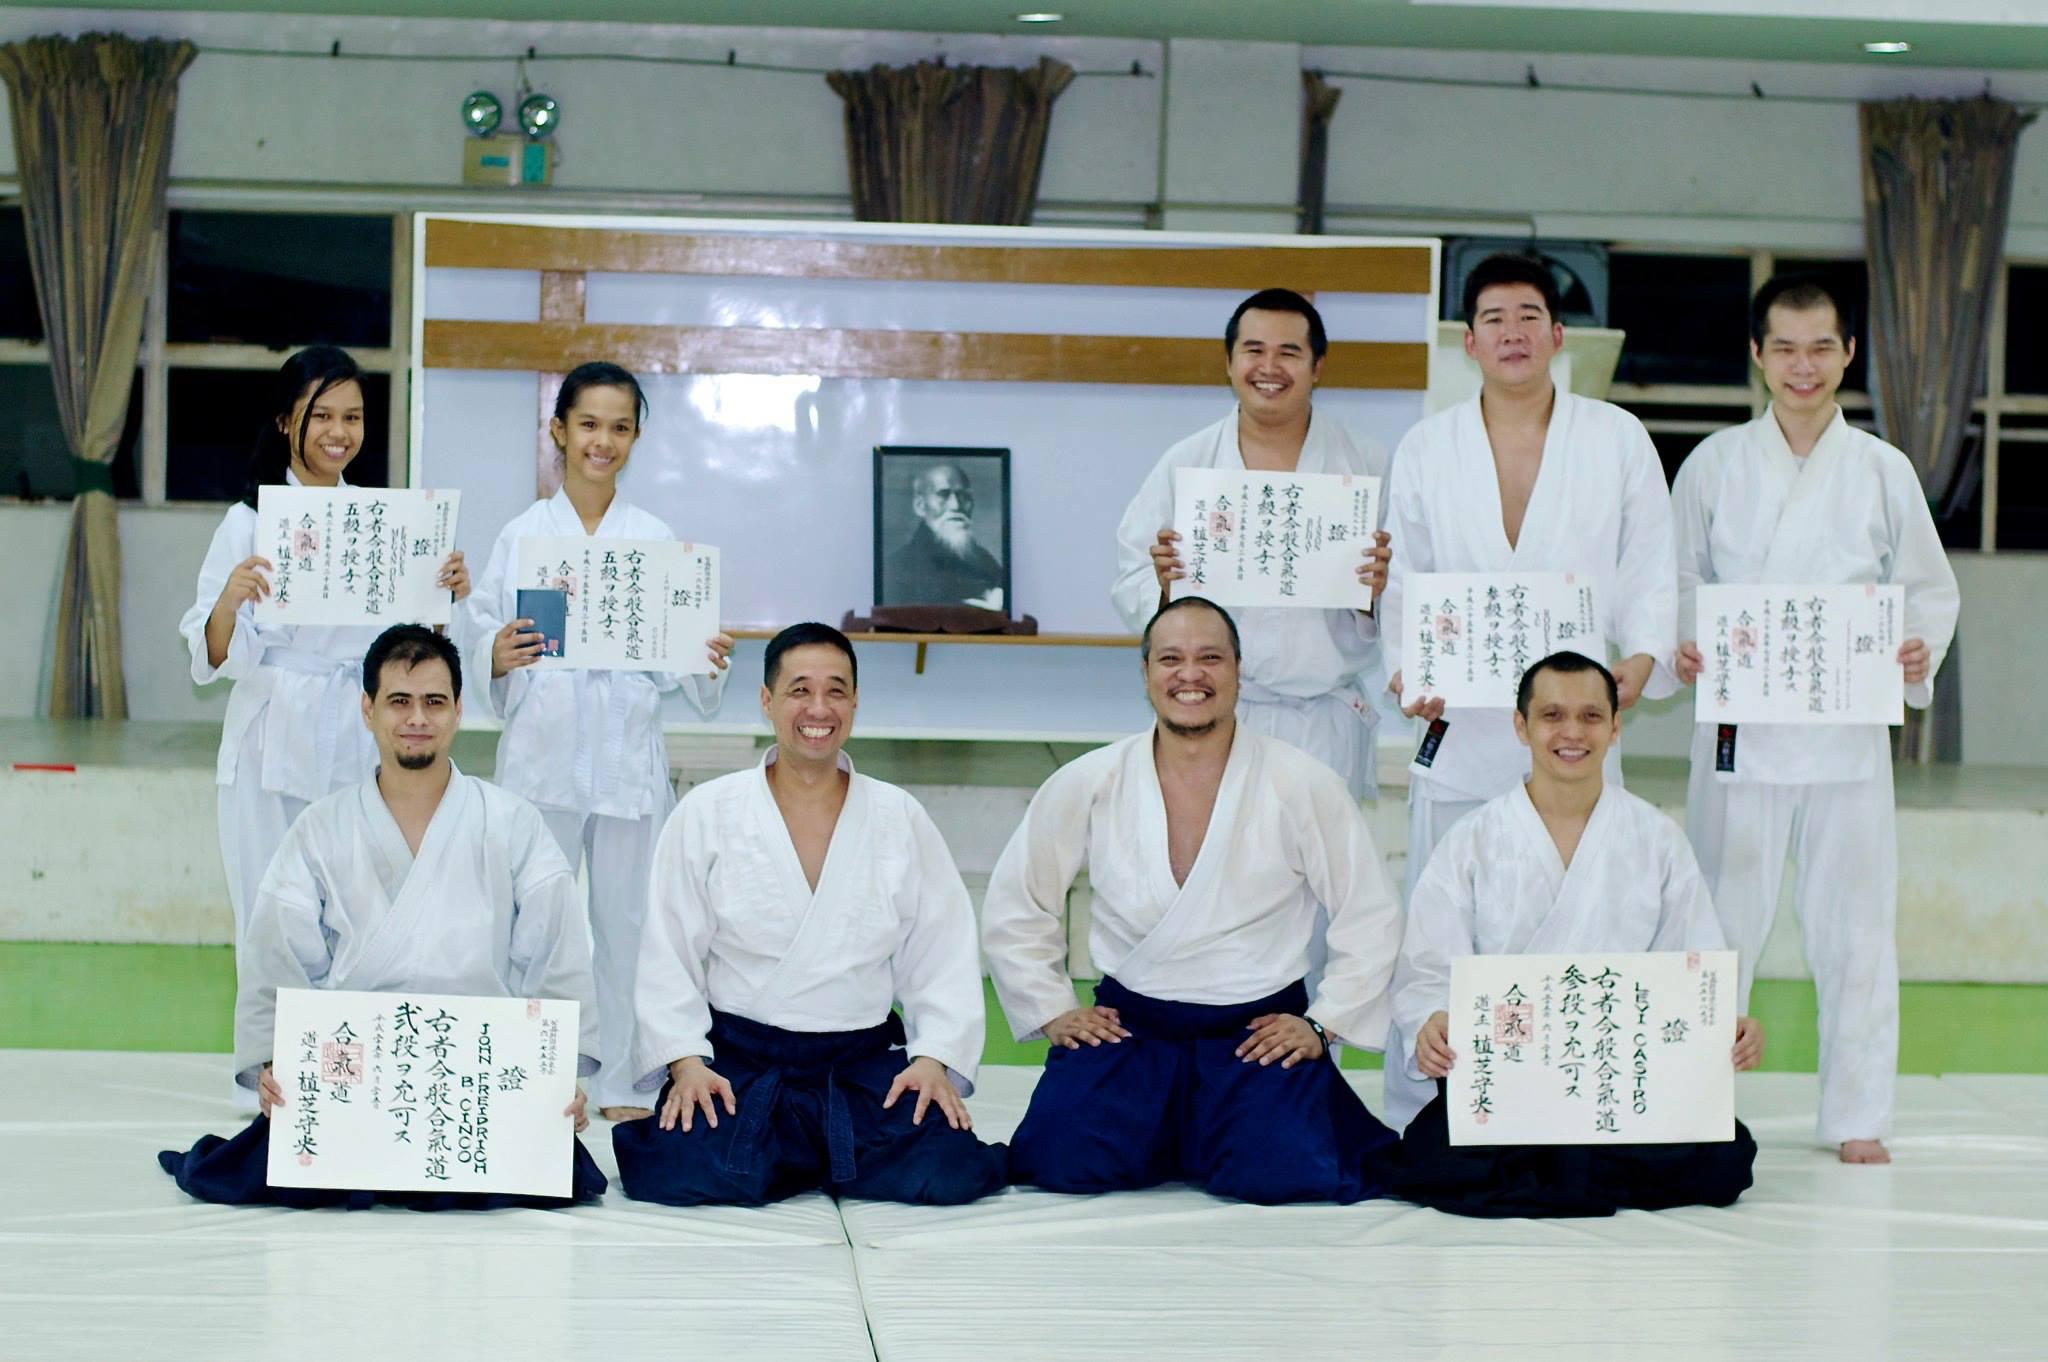 Promotion Certificate Awarding